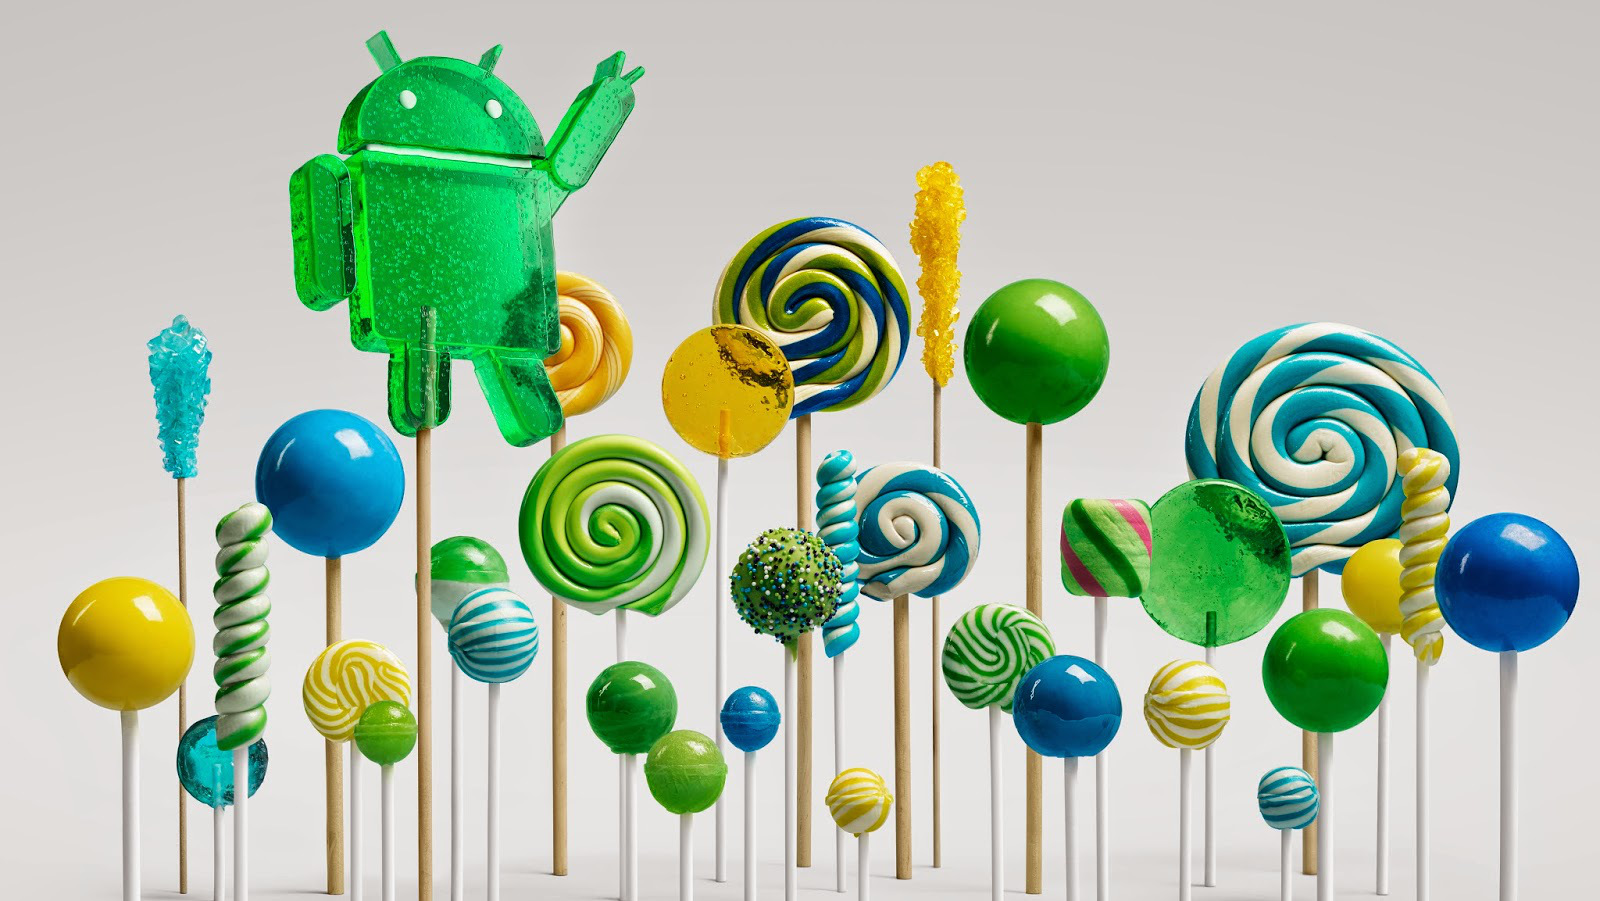 Google mit neuem Android 5.0, Nexus 7 und Nexus 9 plus Android TV